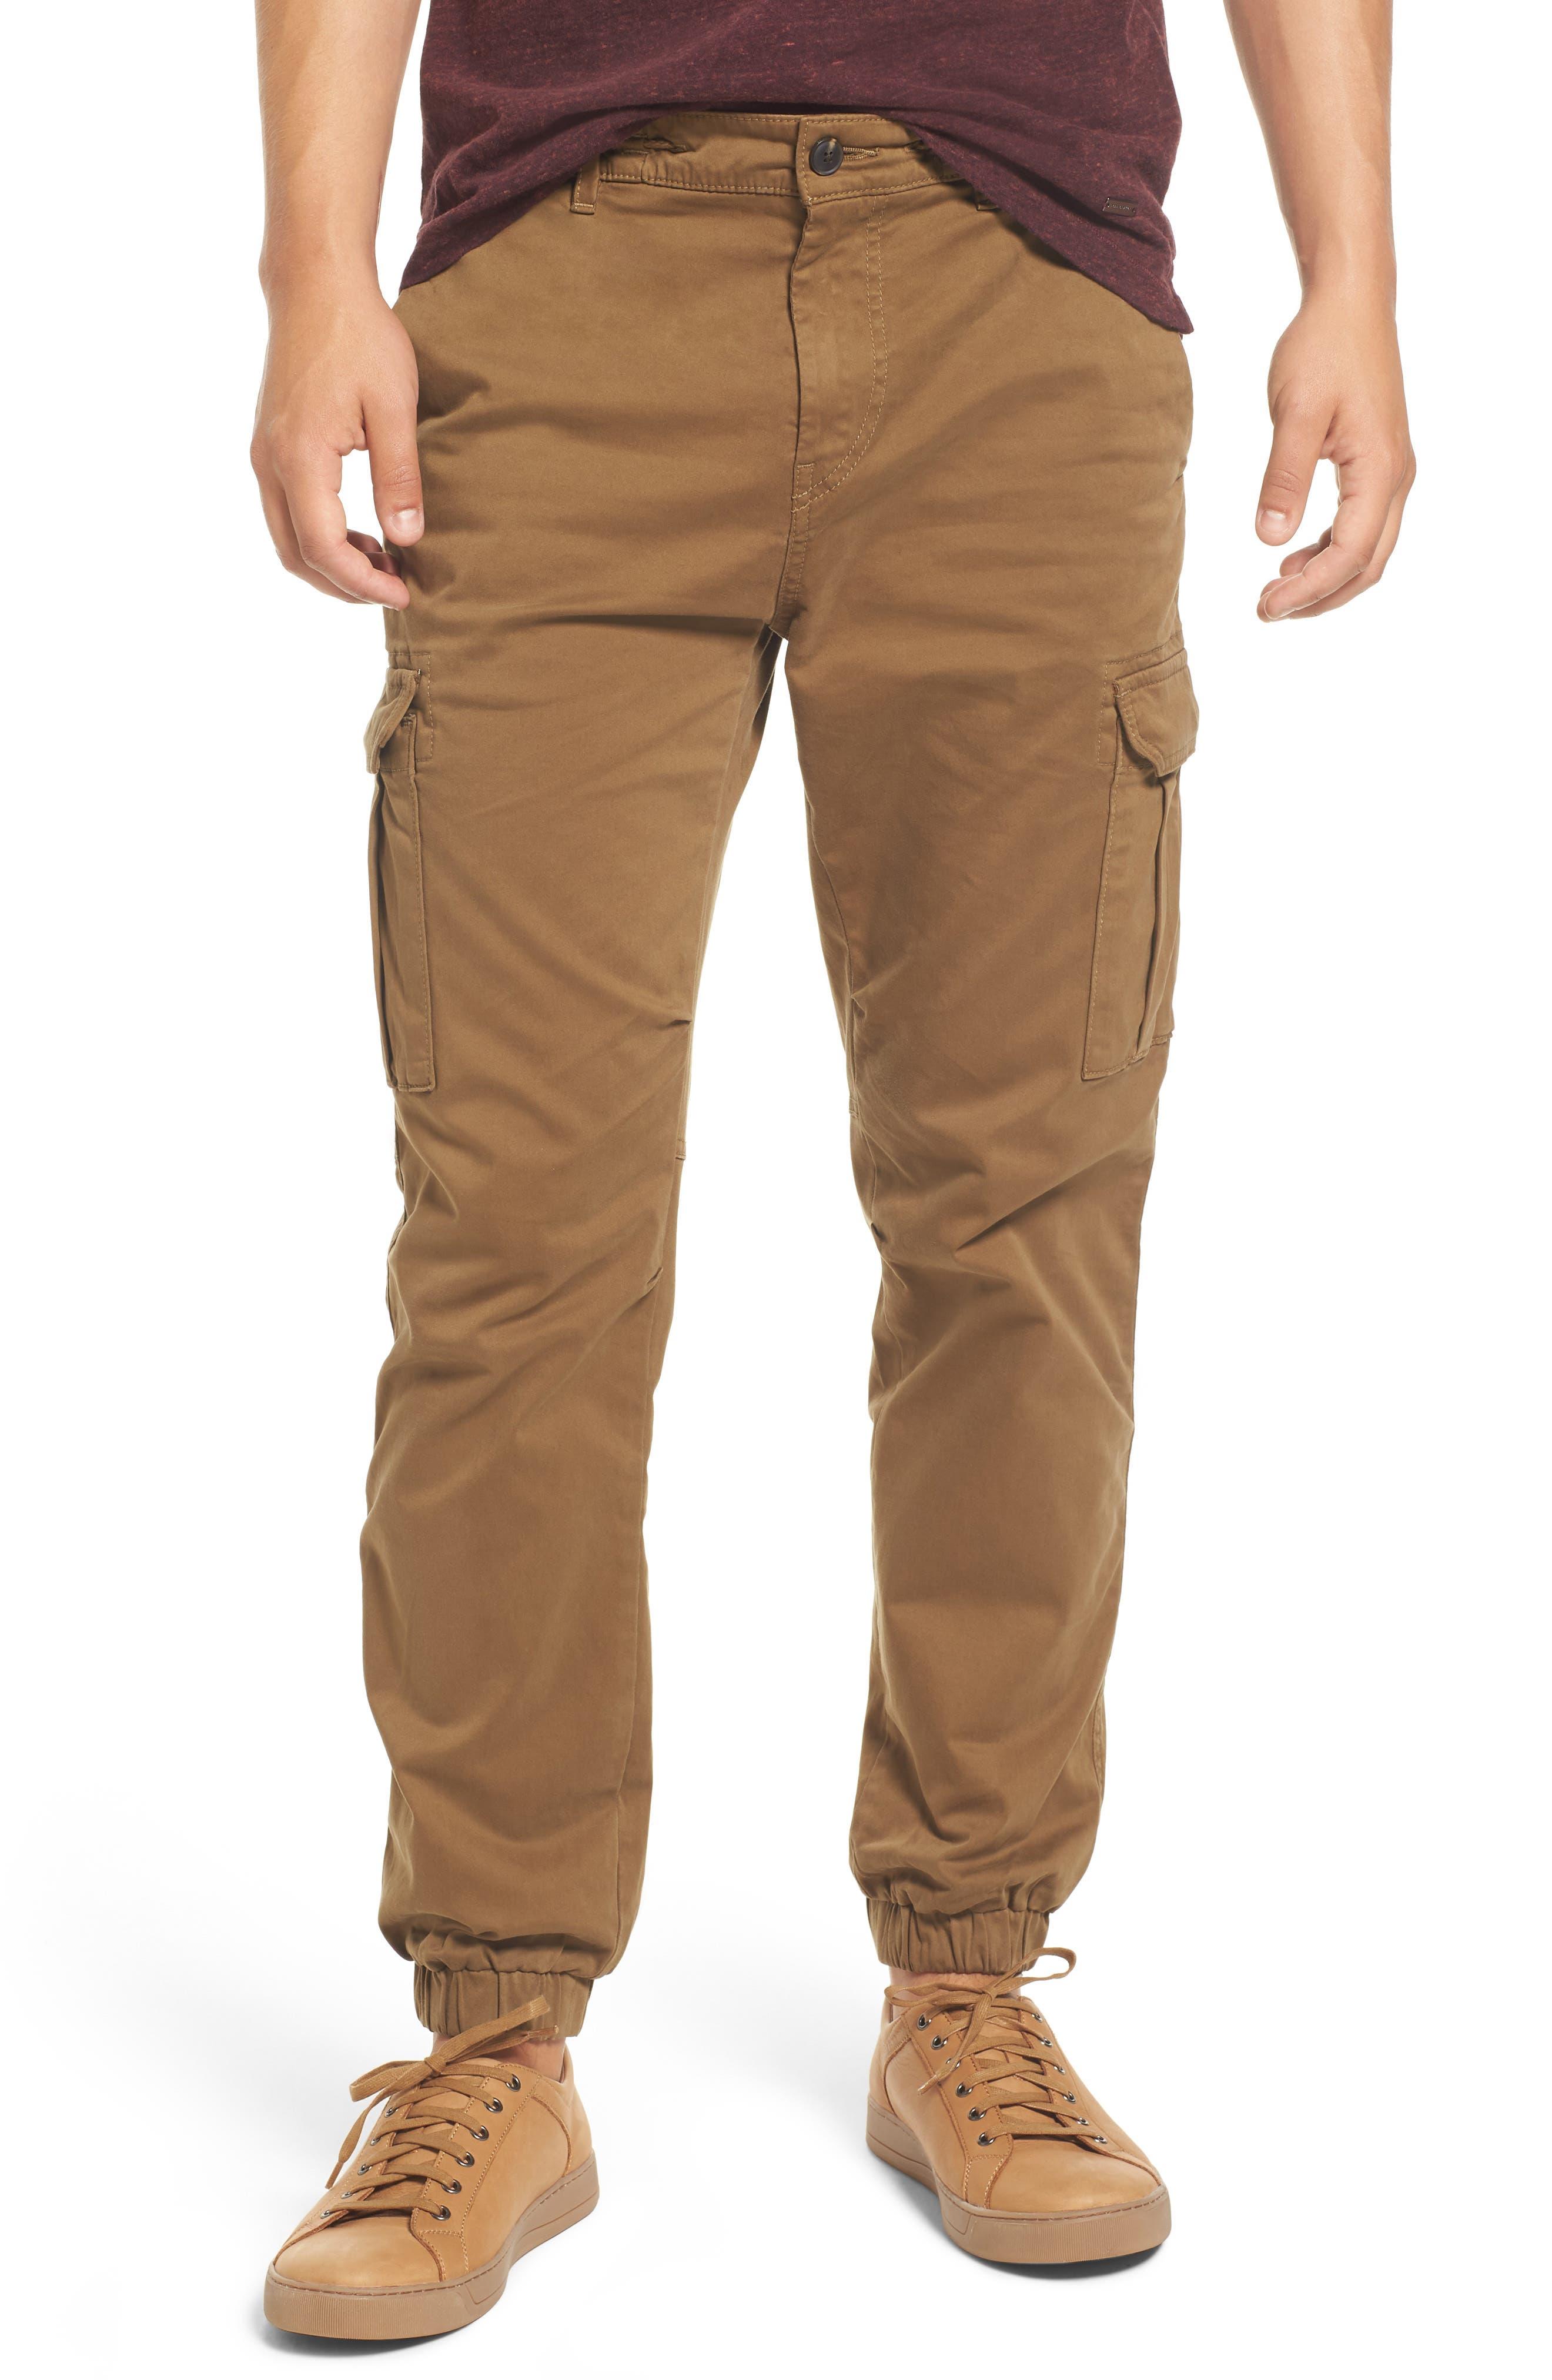 Shay 2 Cargo Pants,                             Main thumbnail 1, color,                             Open Beige